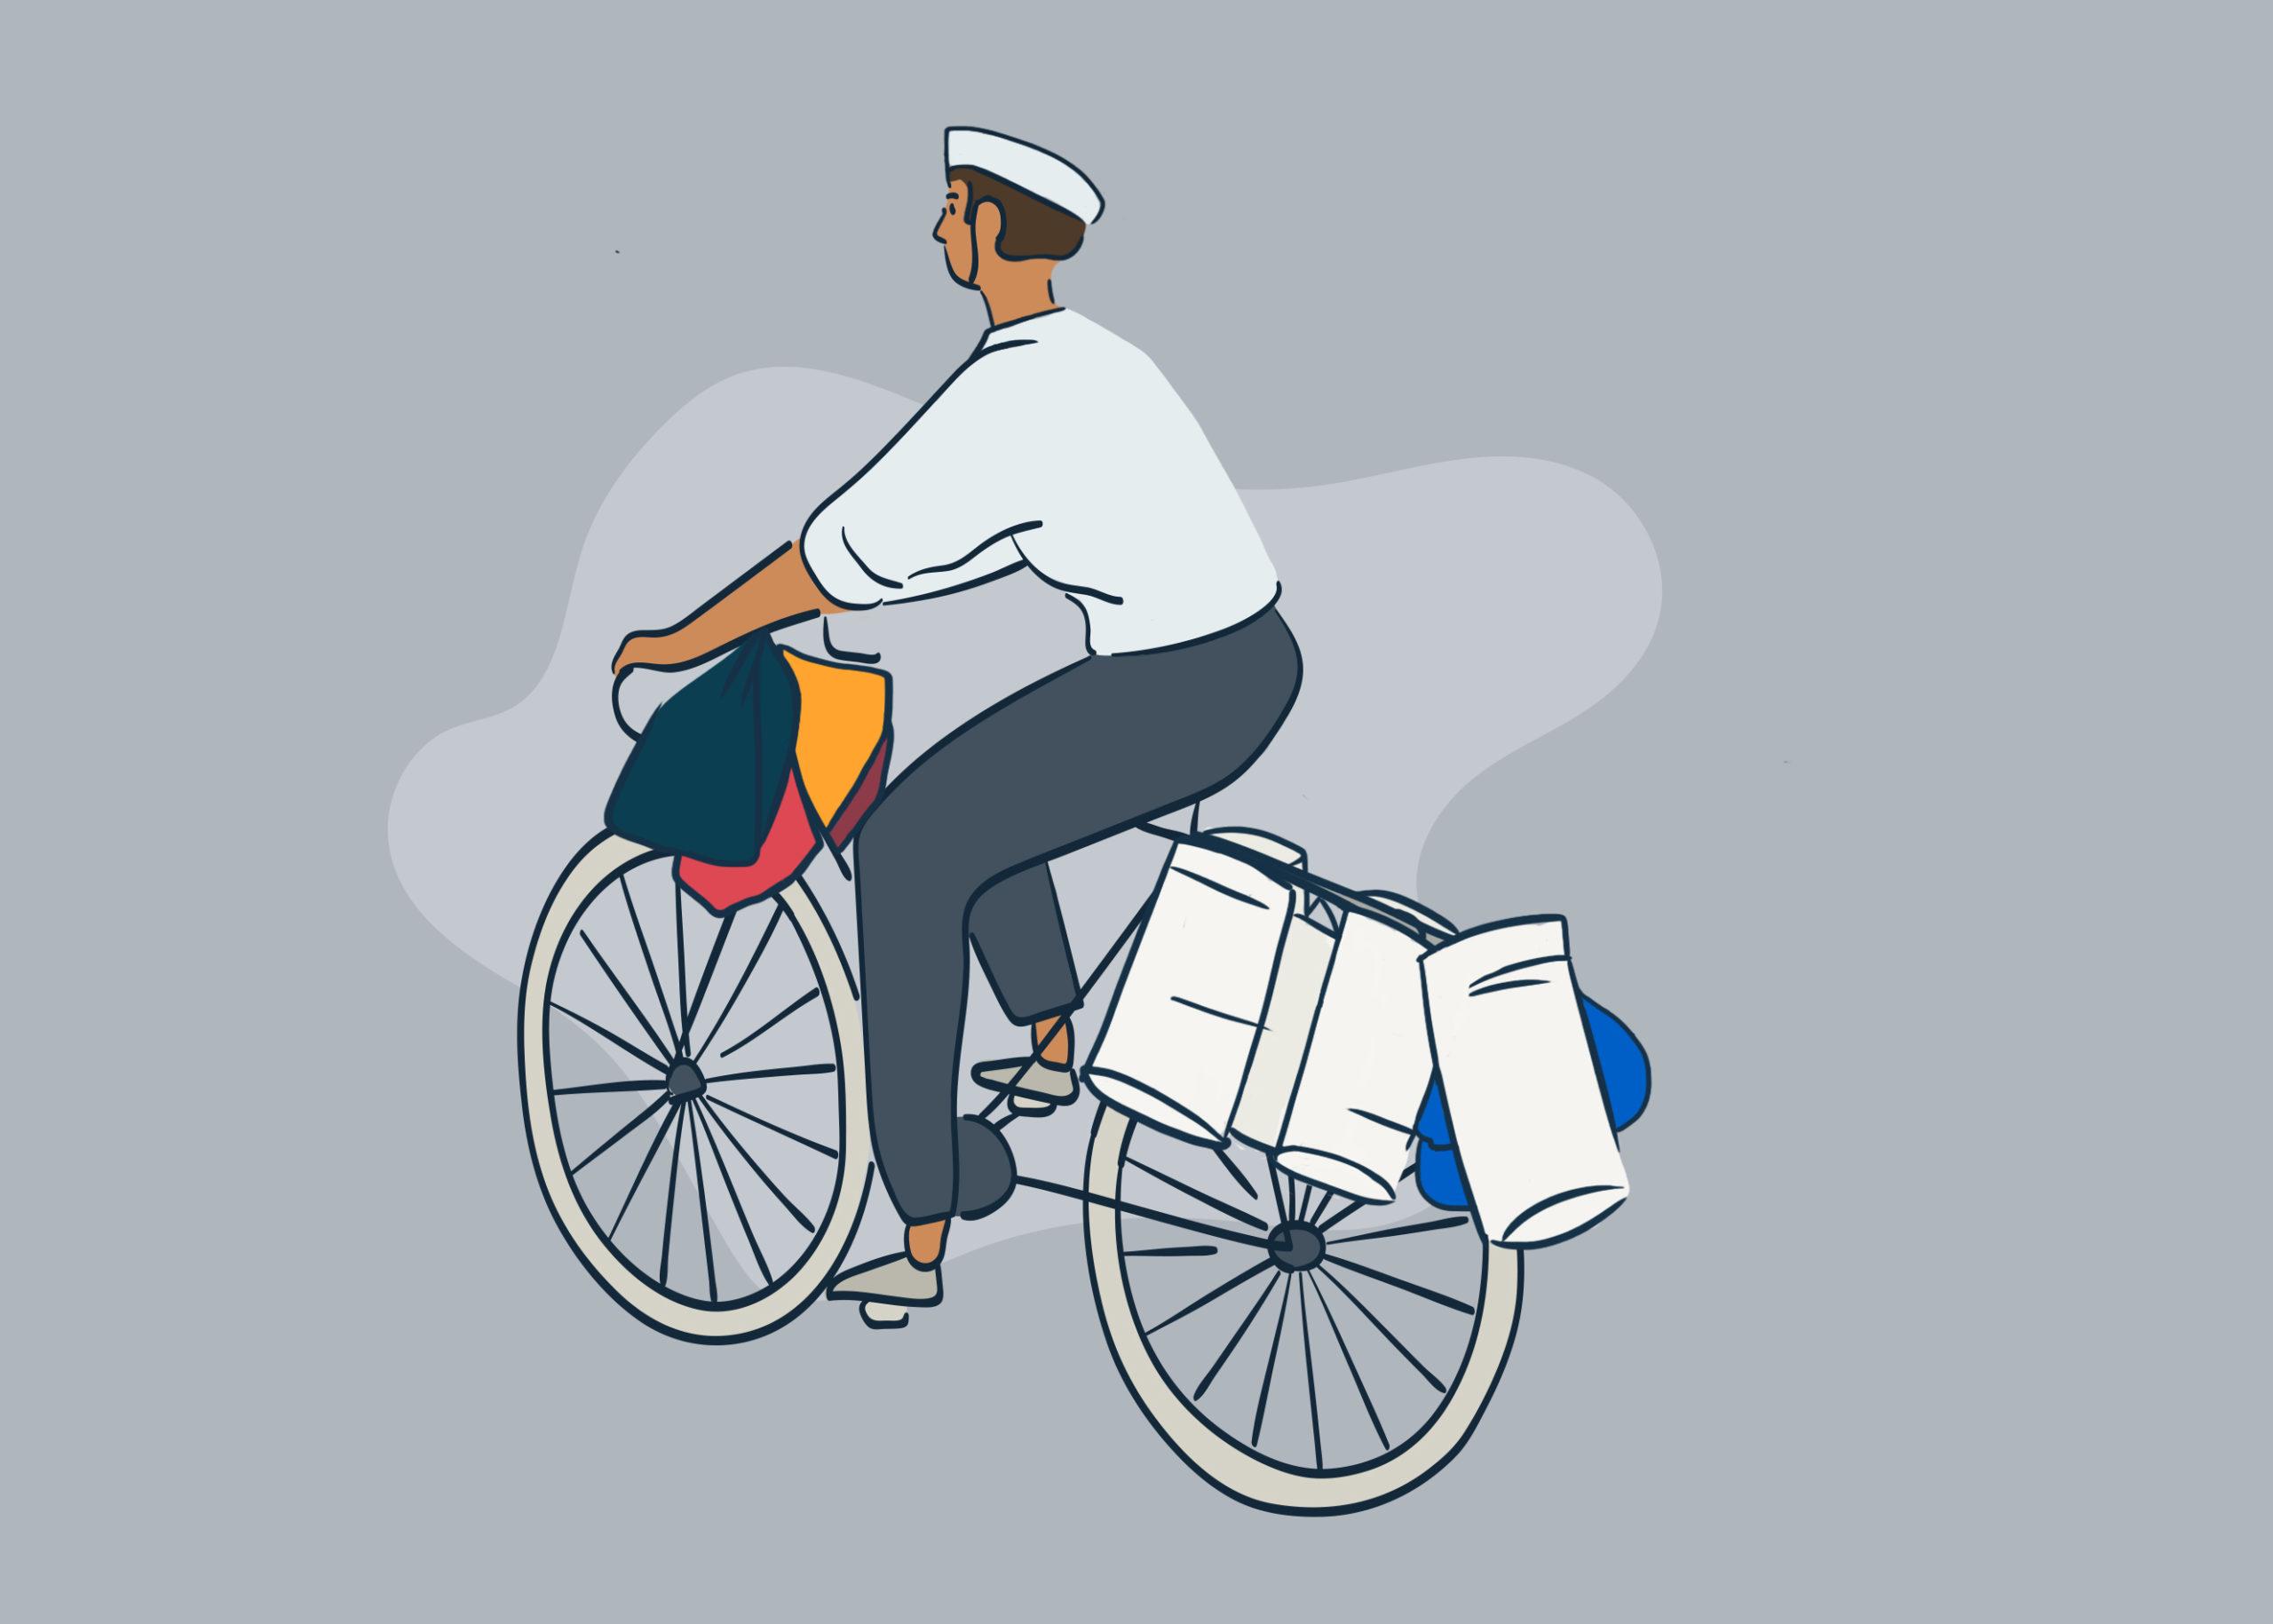 Dabbawala riding a bicycle